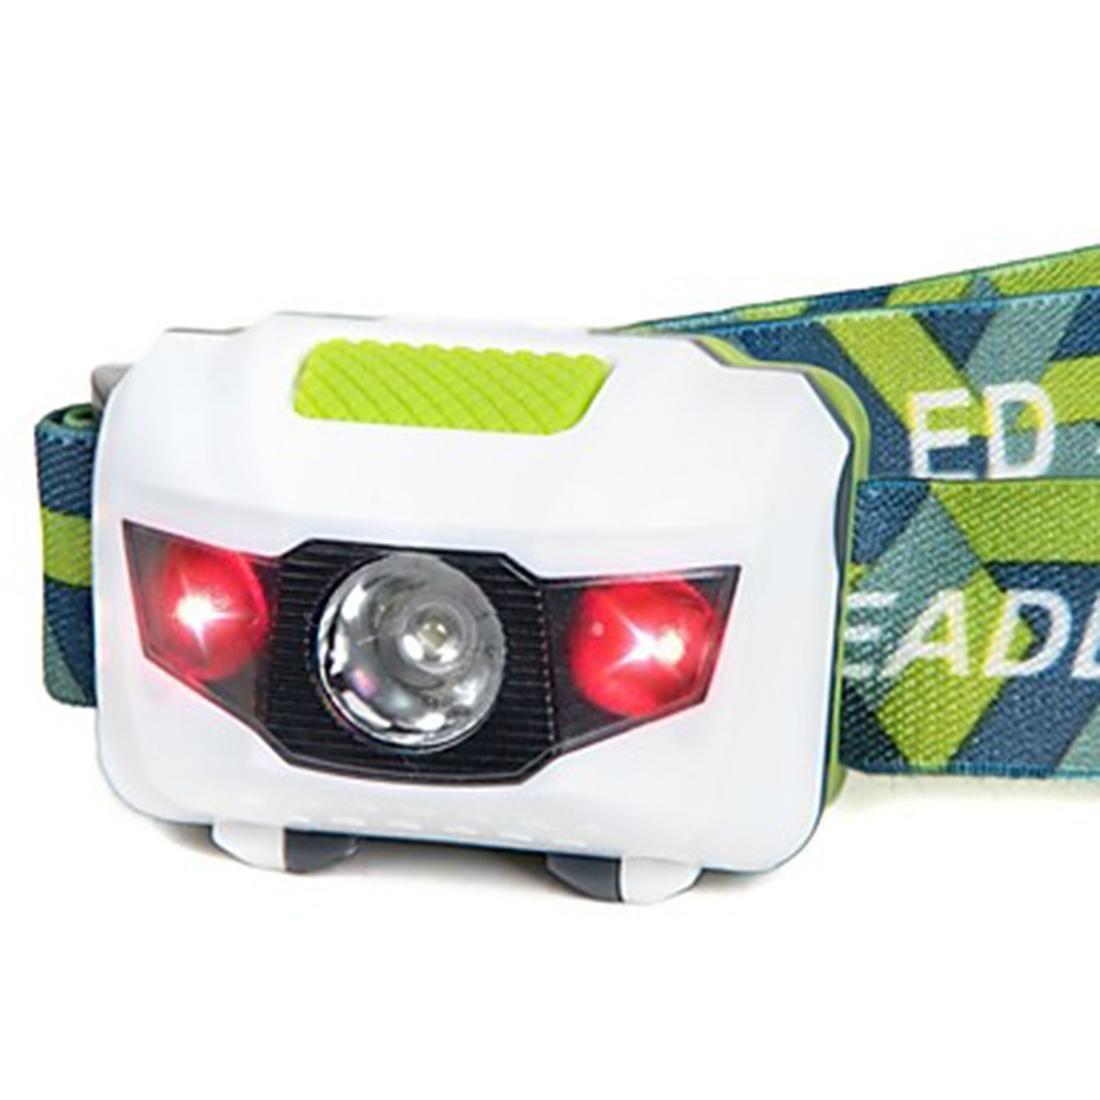 Mini Ultra-light Portable 1 White 2 Red LED Headlamp Headlight Hands-free Flashlight For 3 AAA Batteries Night Fishing/Fixing/Cycling/Reading Light